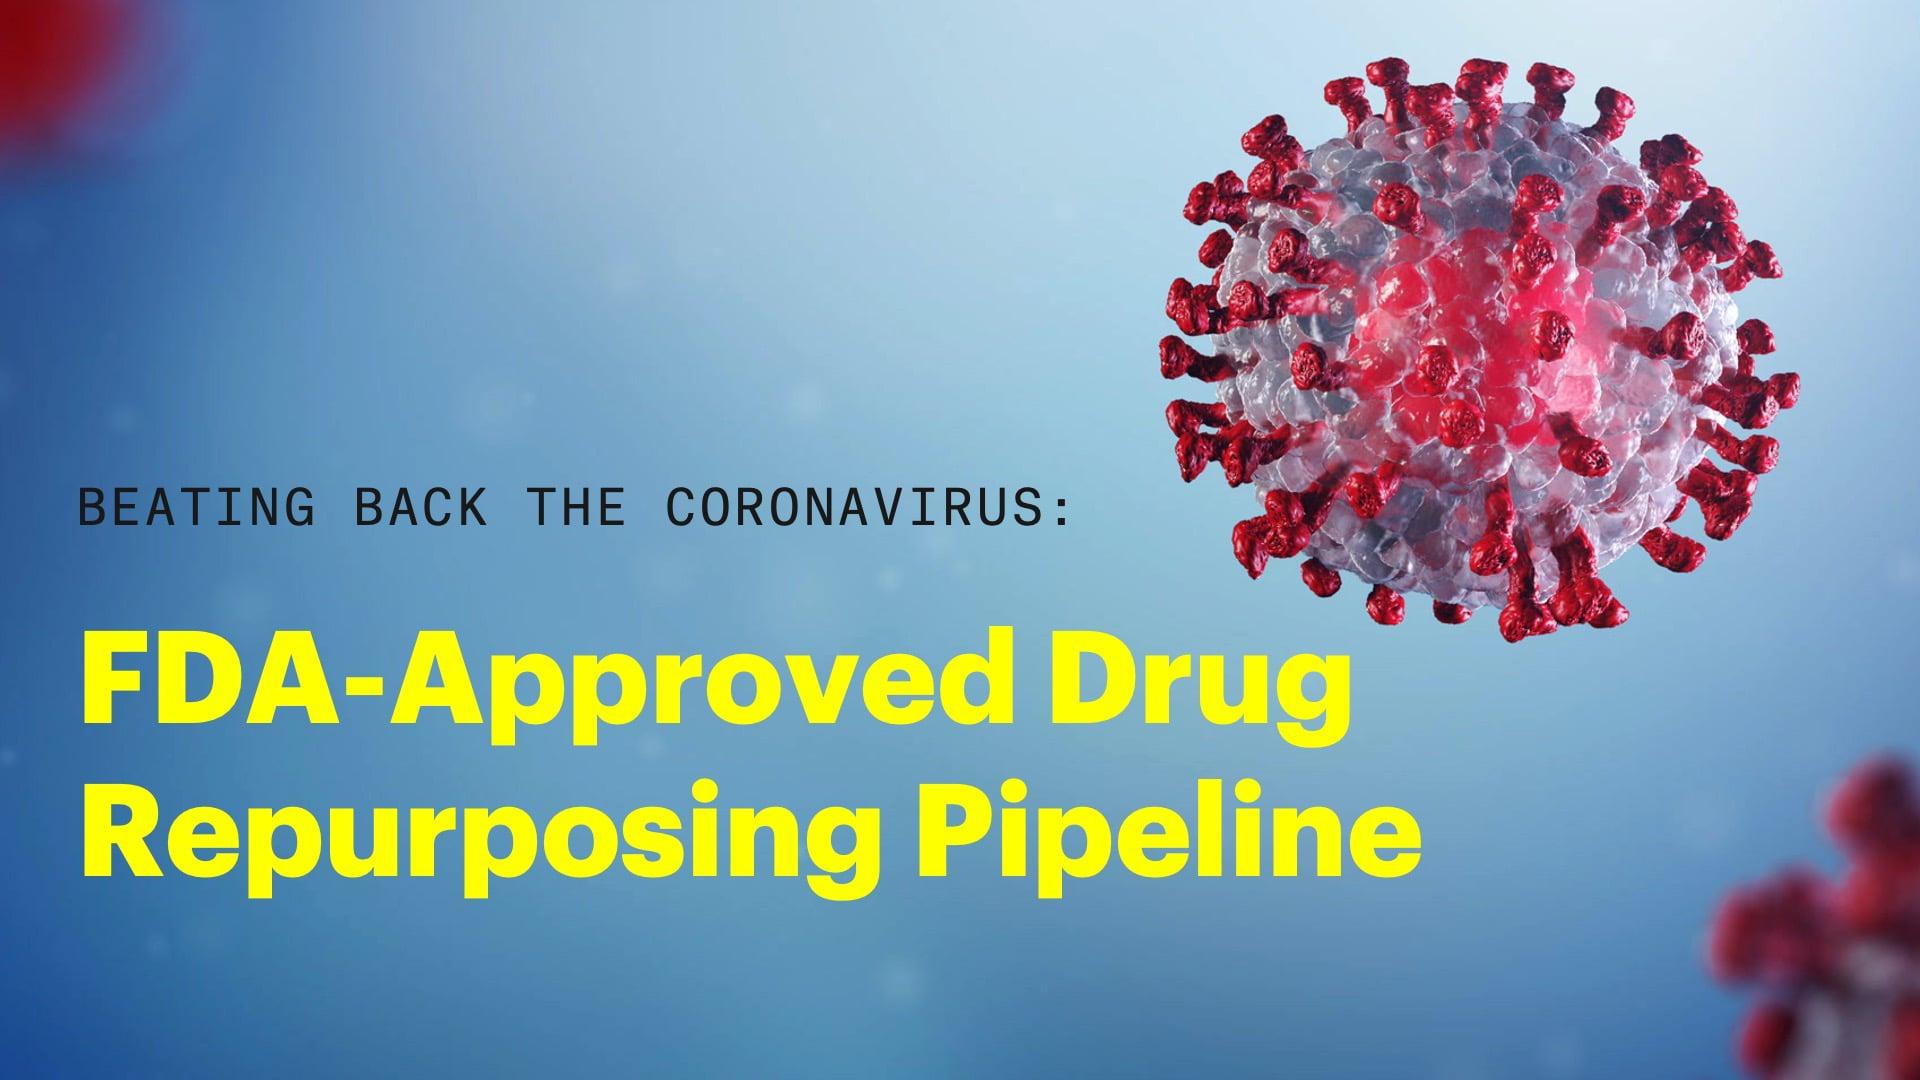 Beating Back the Coronavirus: FDA-Approved Drug Repurposing Pipeline